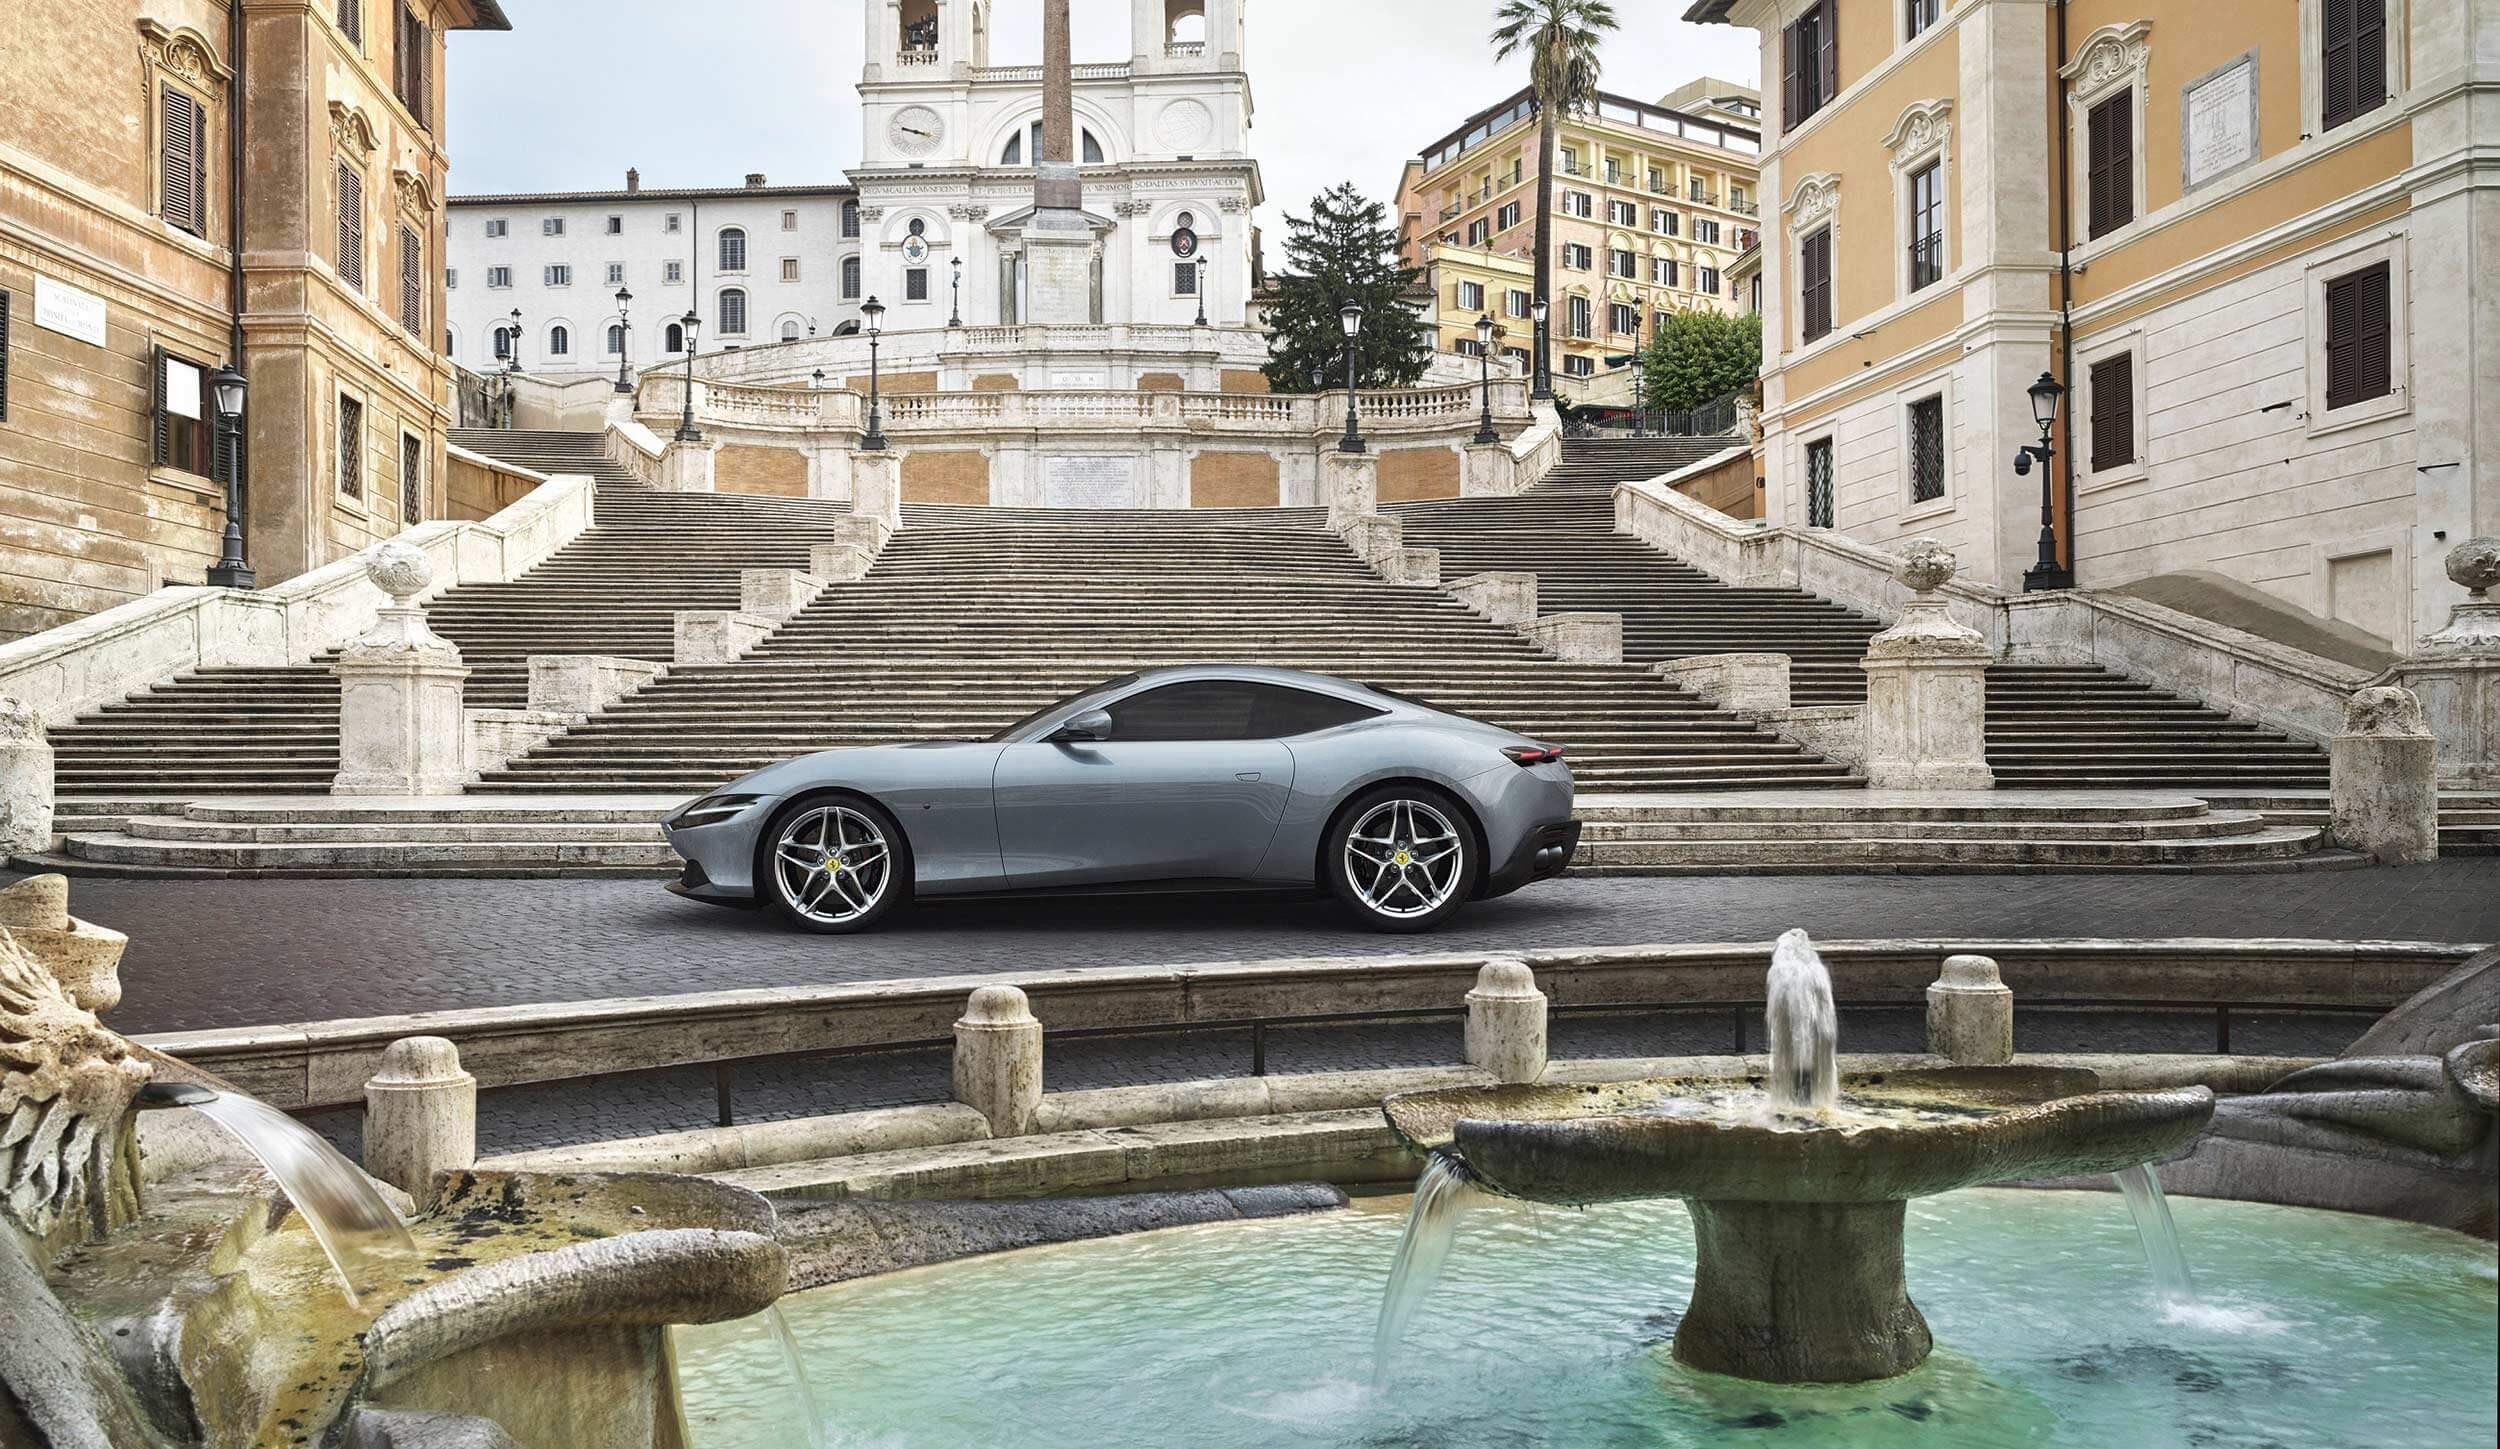 Ferrari near steps